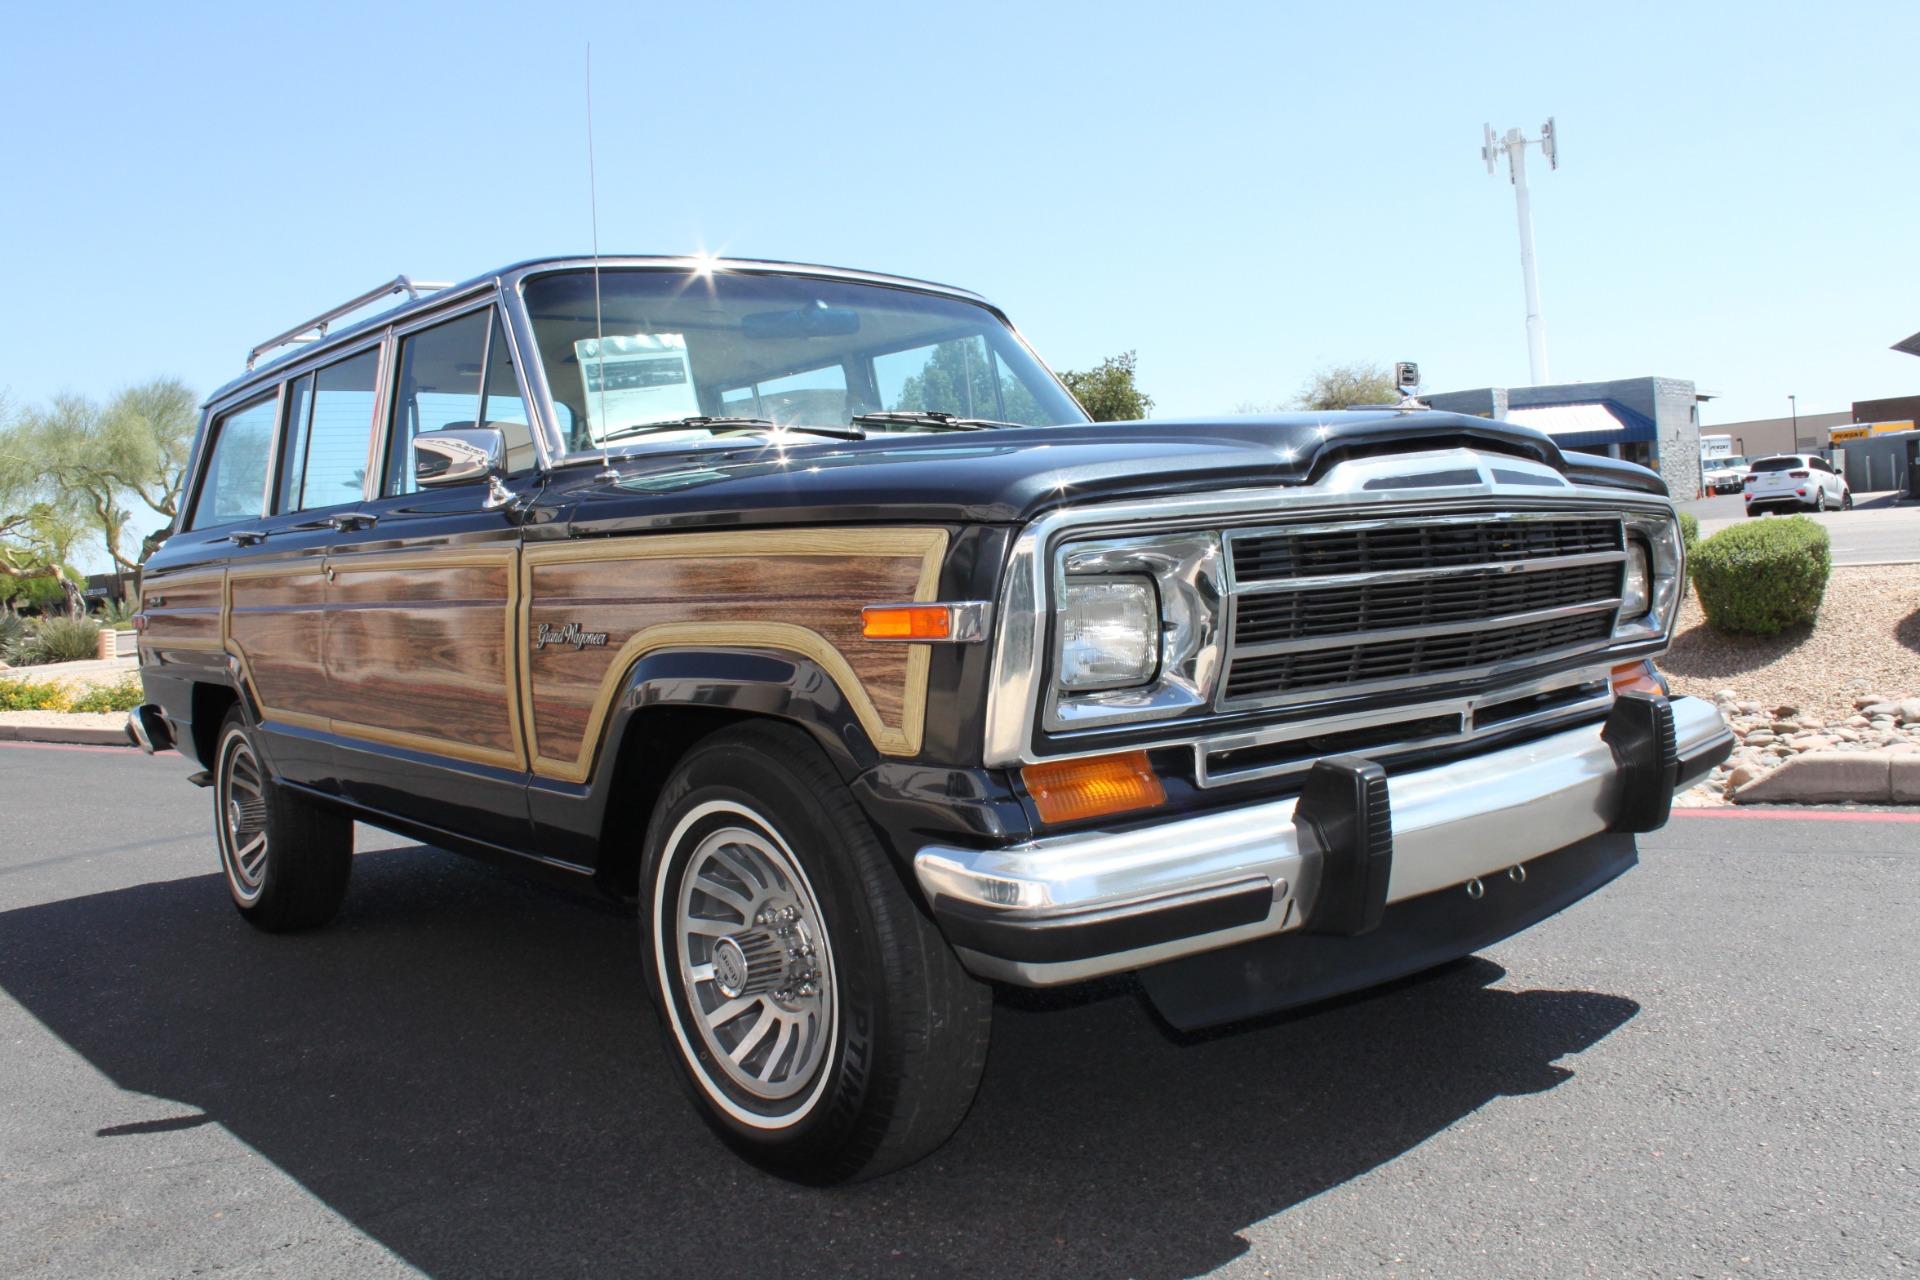 Used-1991-Jeep-Grand-Wagoneer-4X4-Mercedes-Benz